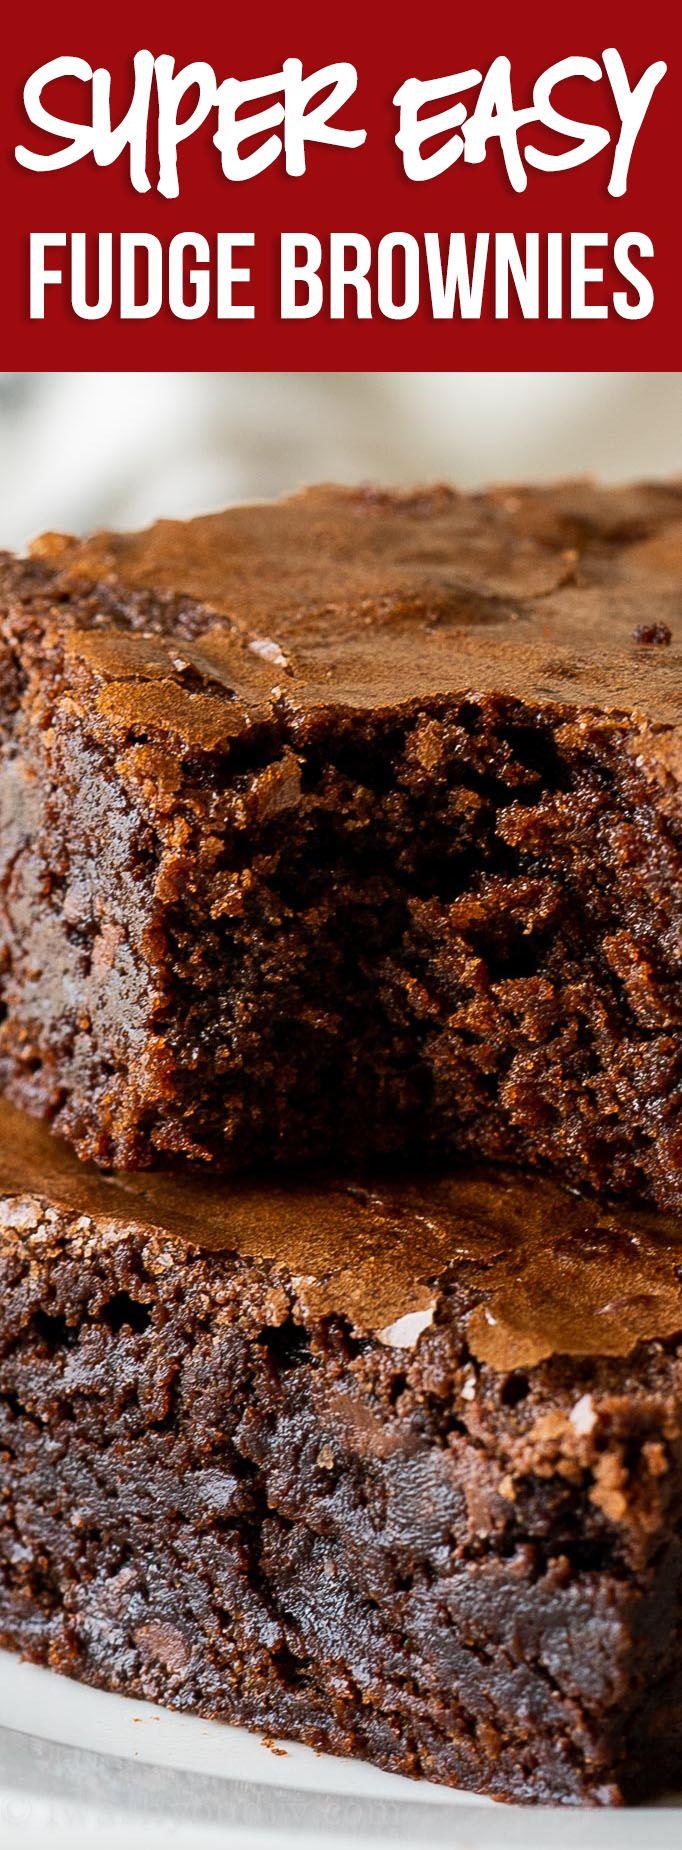 The BEST Fudge Brownie Recipe